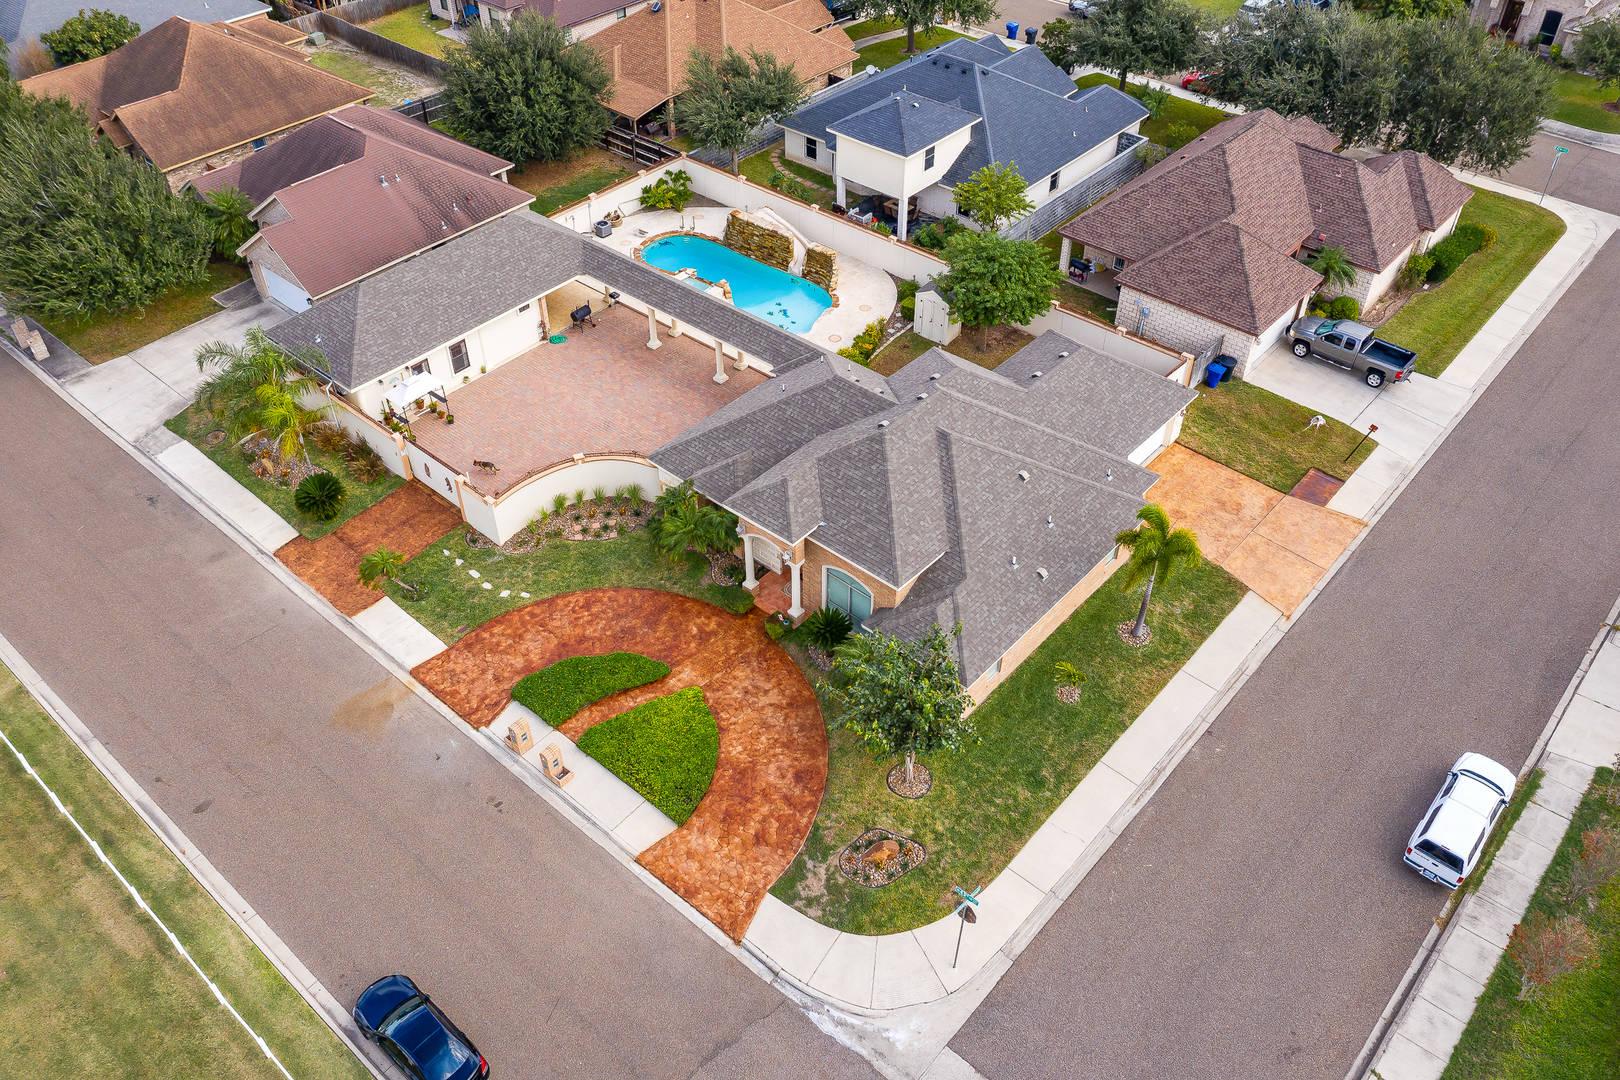 4120 N 43rd St. Mcallen, TX 78504